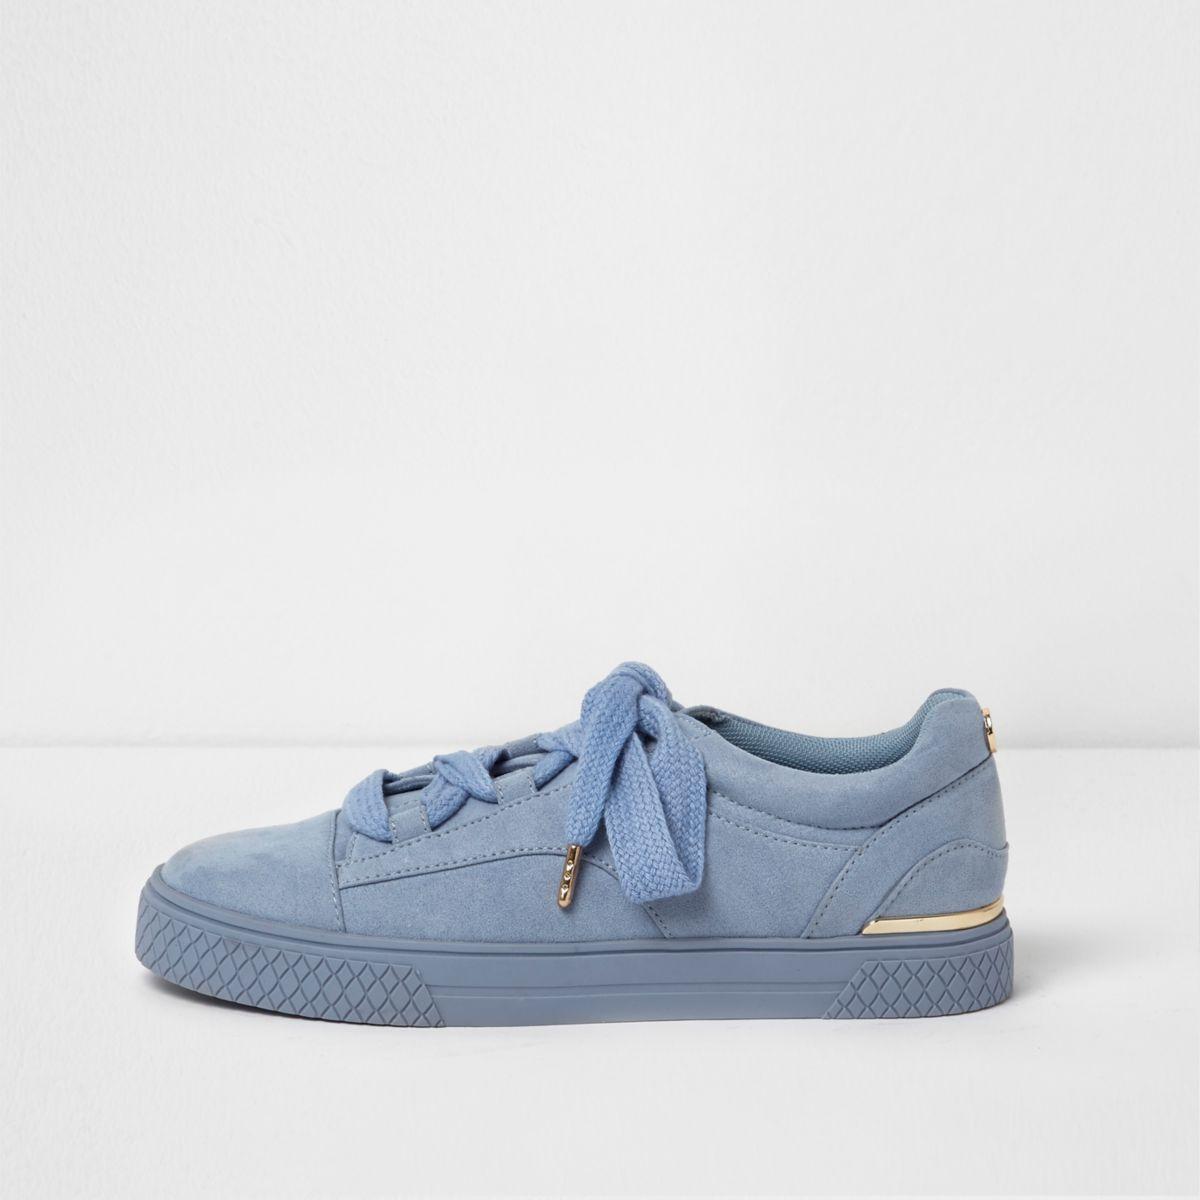 Lichtblauwe grove vetersneakers